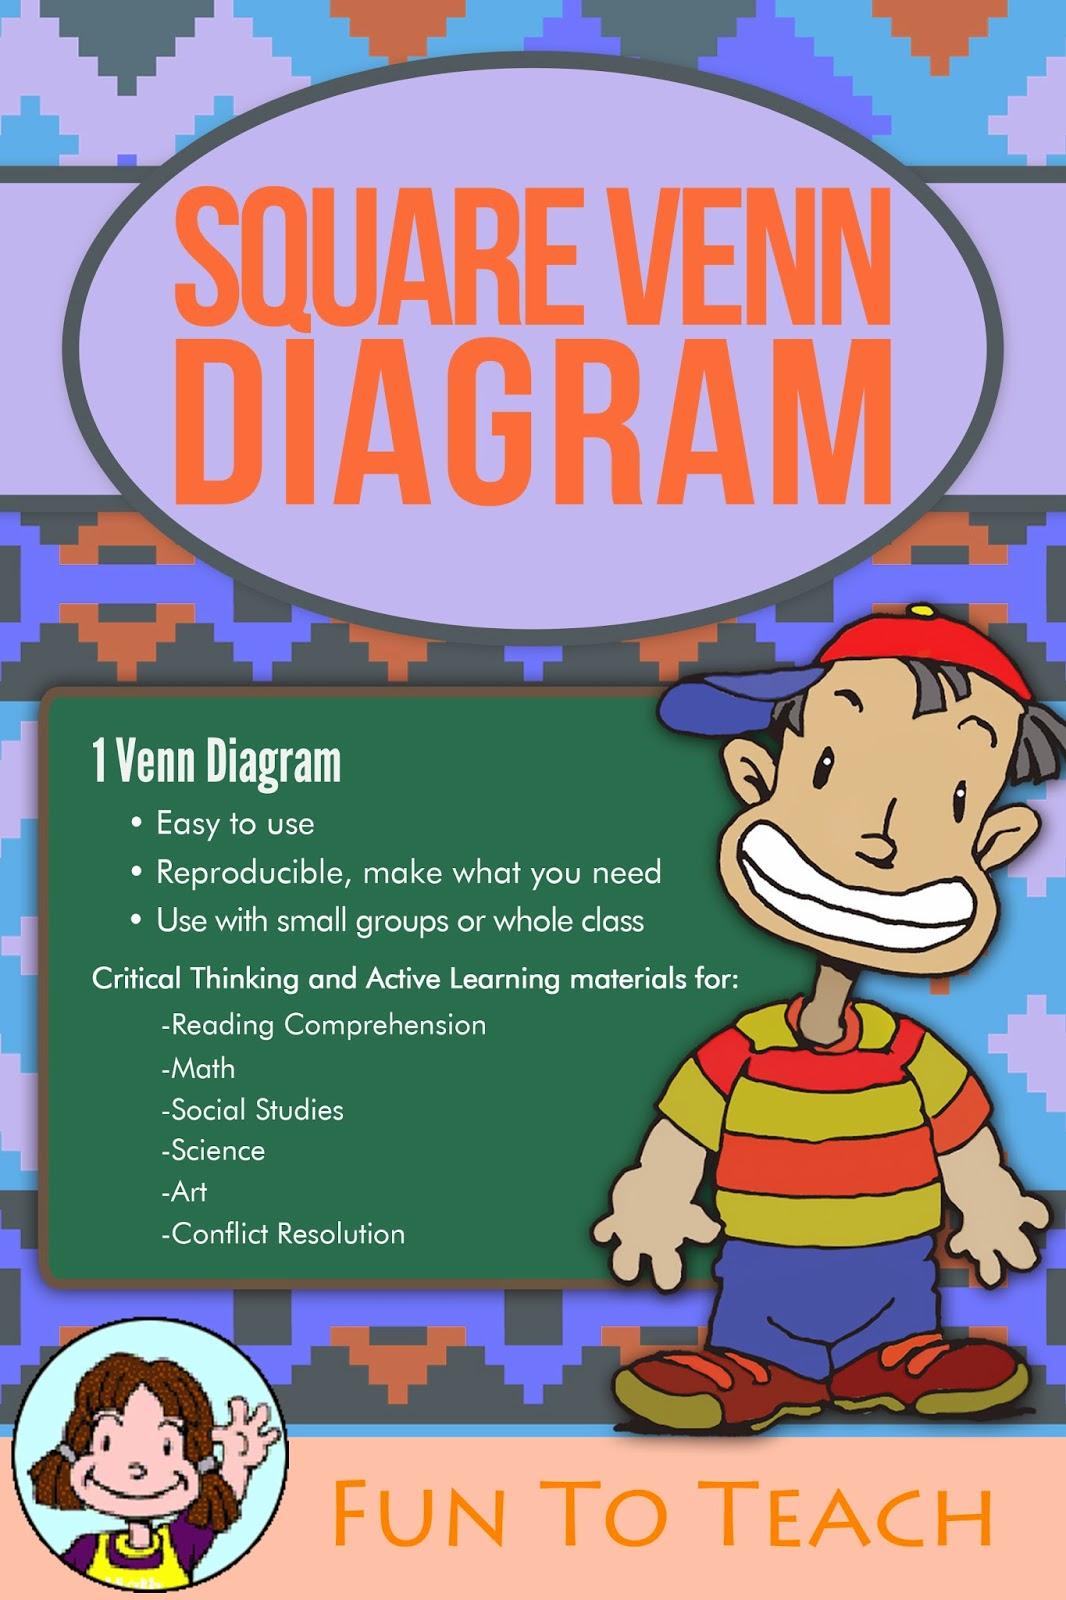 https://www.teacherspayteachers.com/Product/2-Square-Venn-Diagram-Graphic-Organizer-and-Lesson-Plan-88098